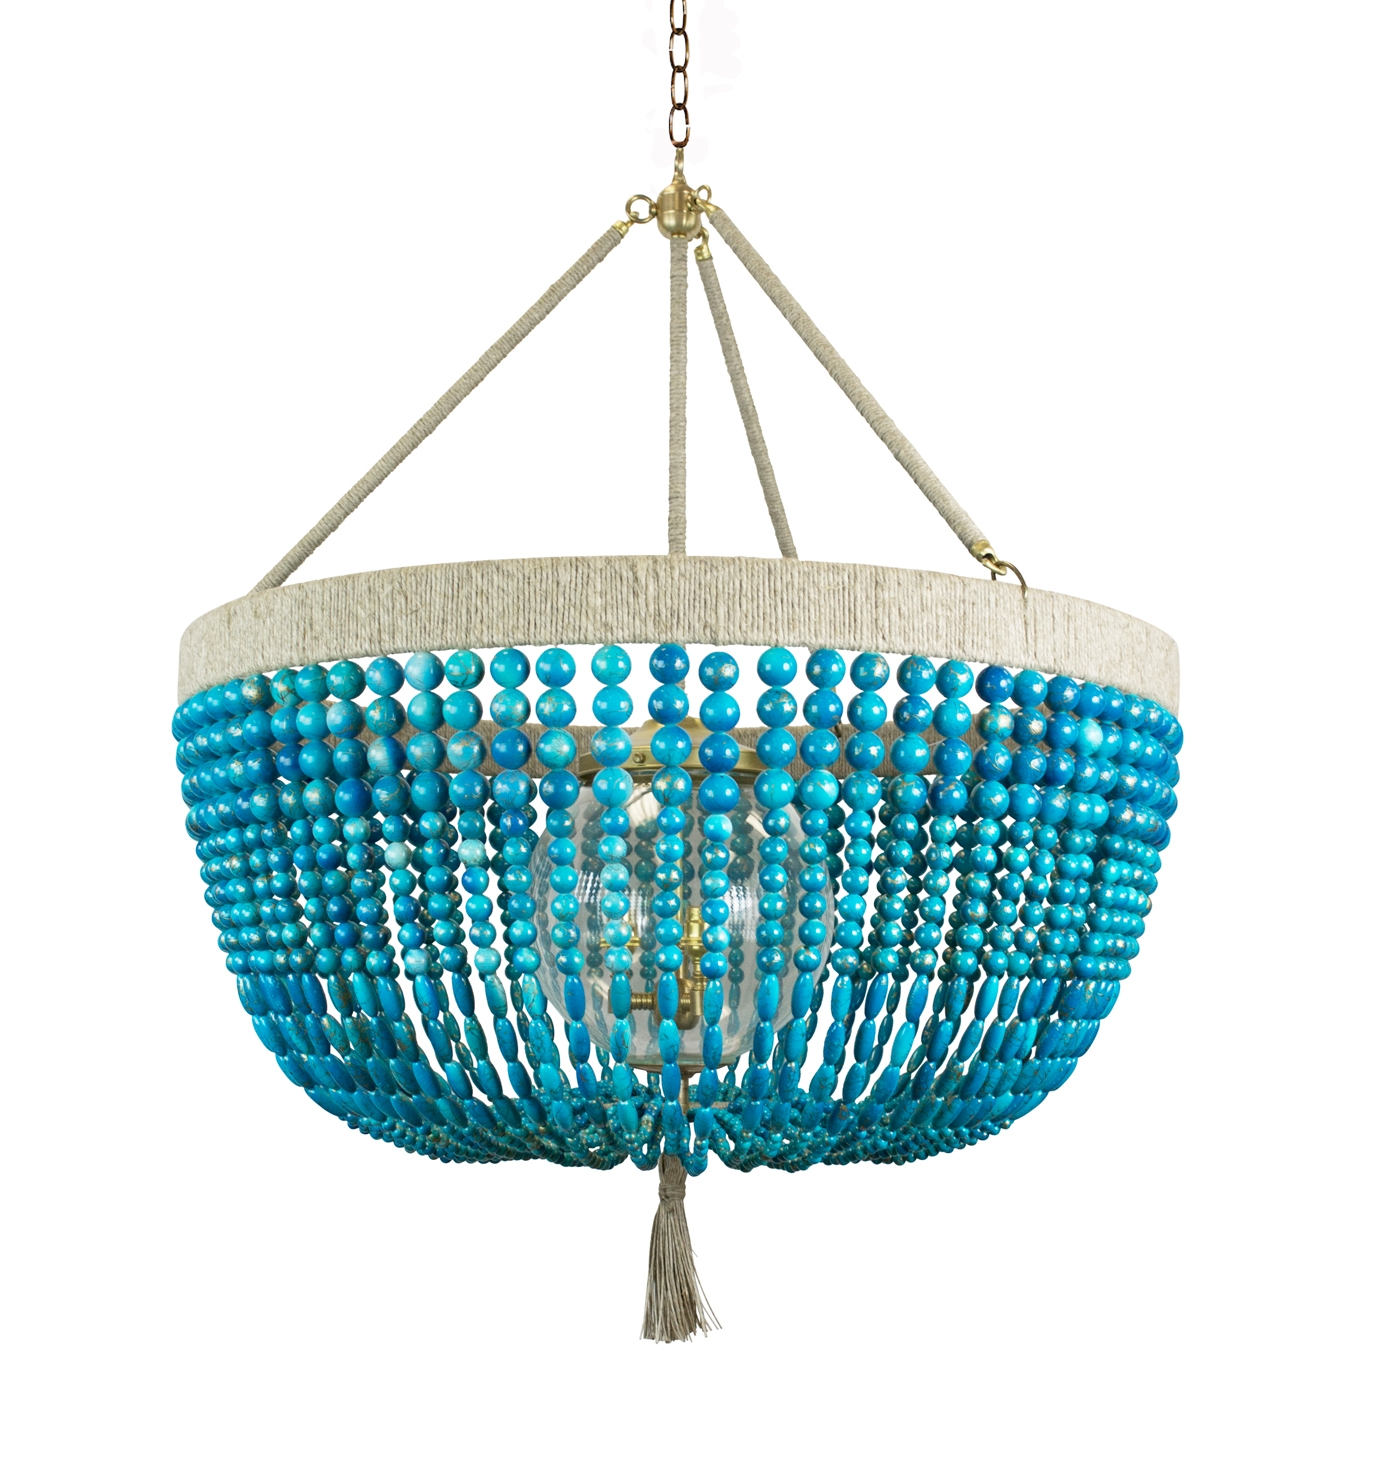 Malibu 30 Turquoise Swirl Outdoor Chandelier Ro Sham Beaux Regarding Turquoise Chandelier Lights (Image 21 of 25)